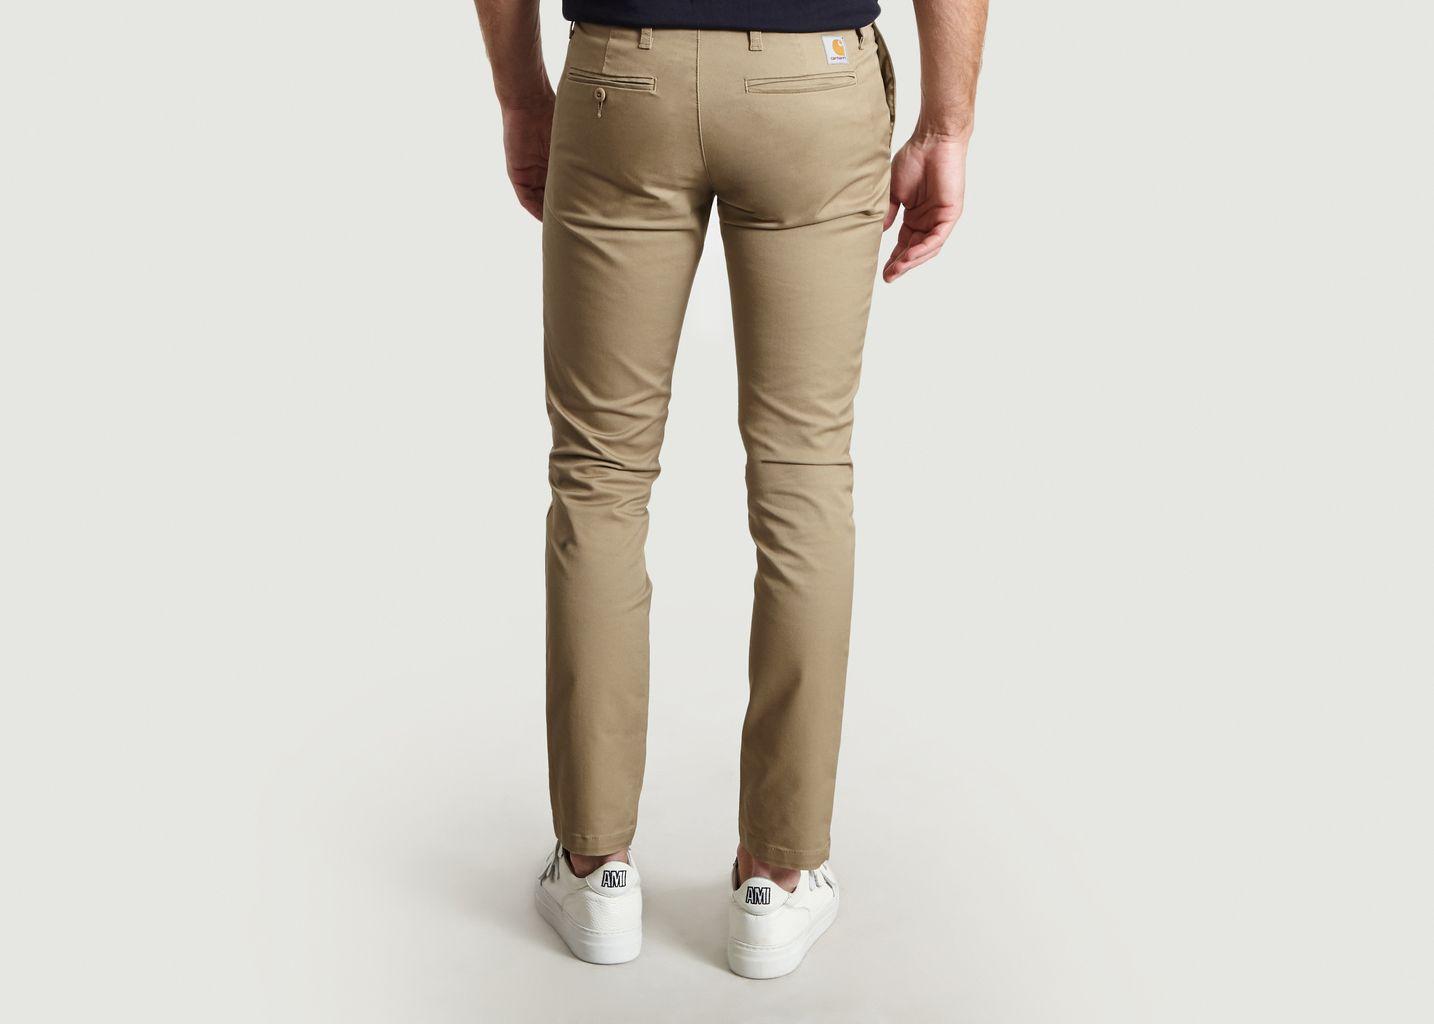 Pantalon Chino Sid - Carhartt WIP